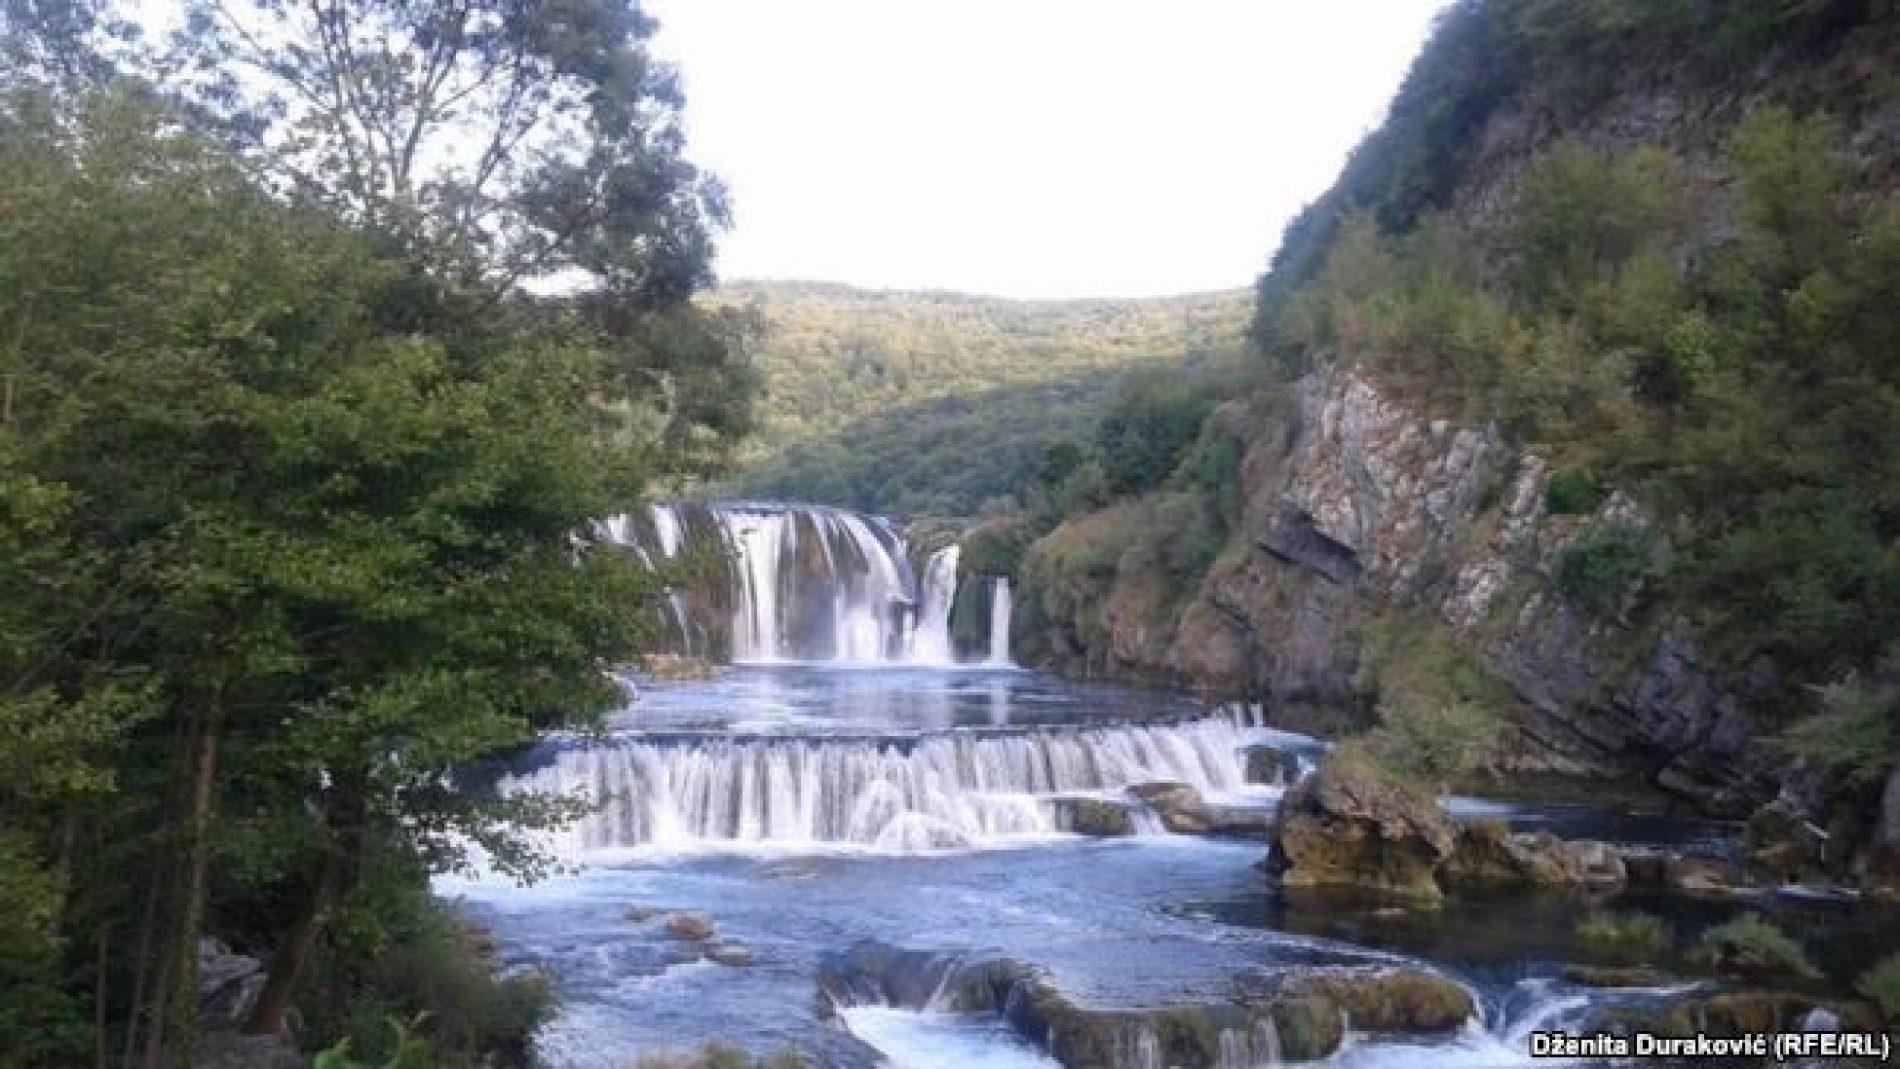 Štrbački buk – biser prirodne ljepote Bosne i Hercegovine